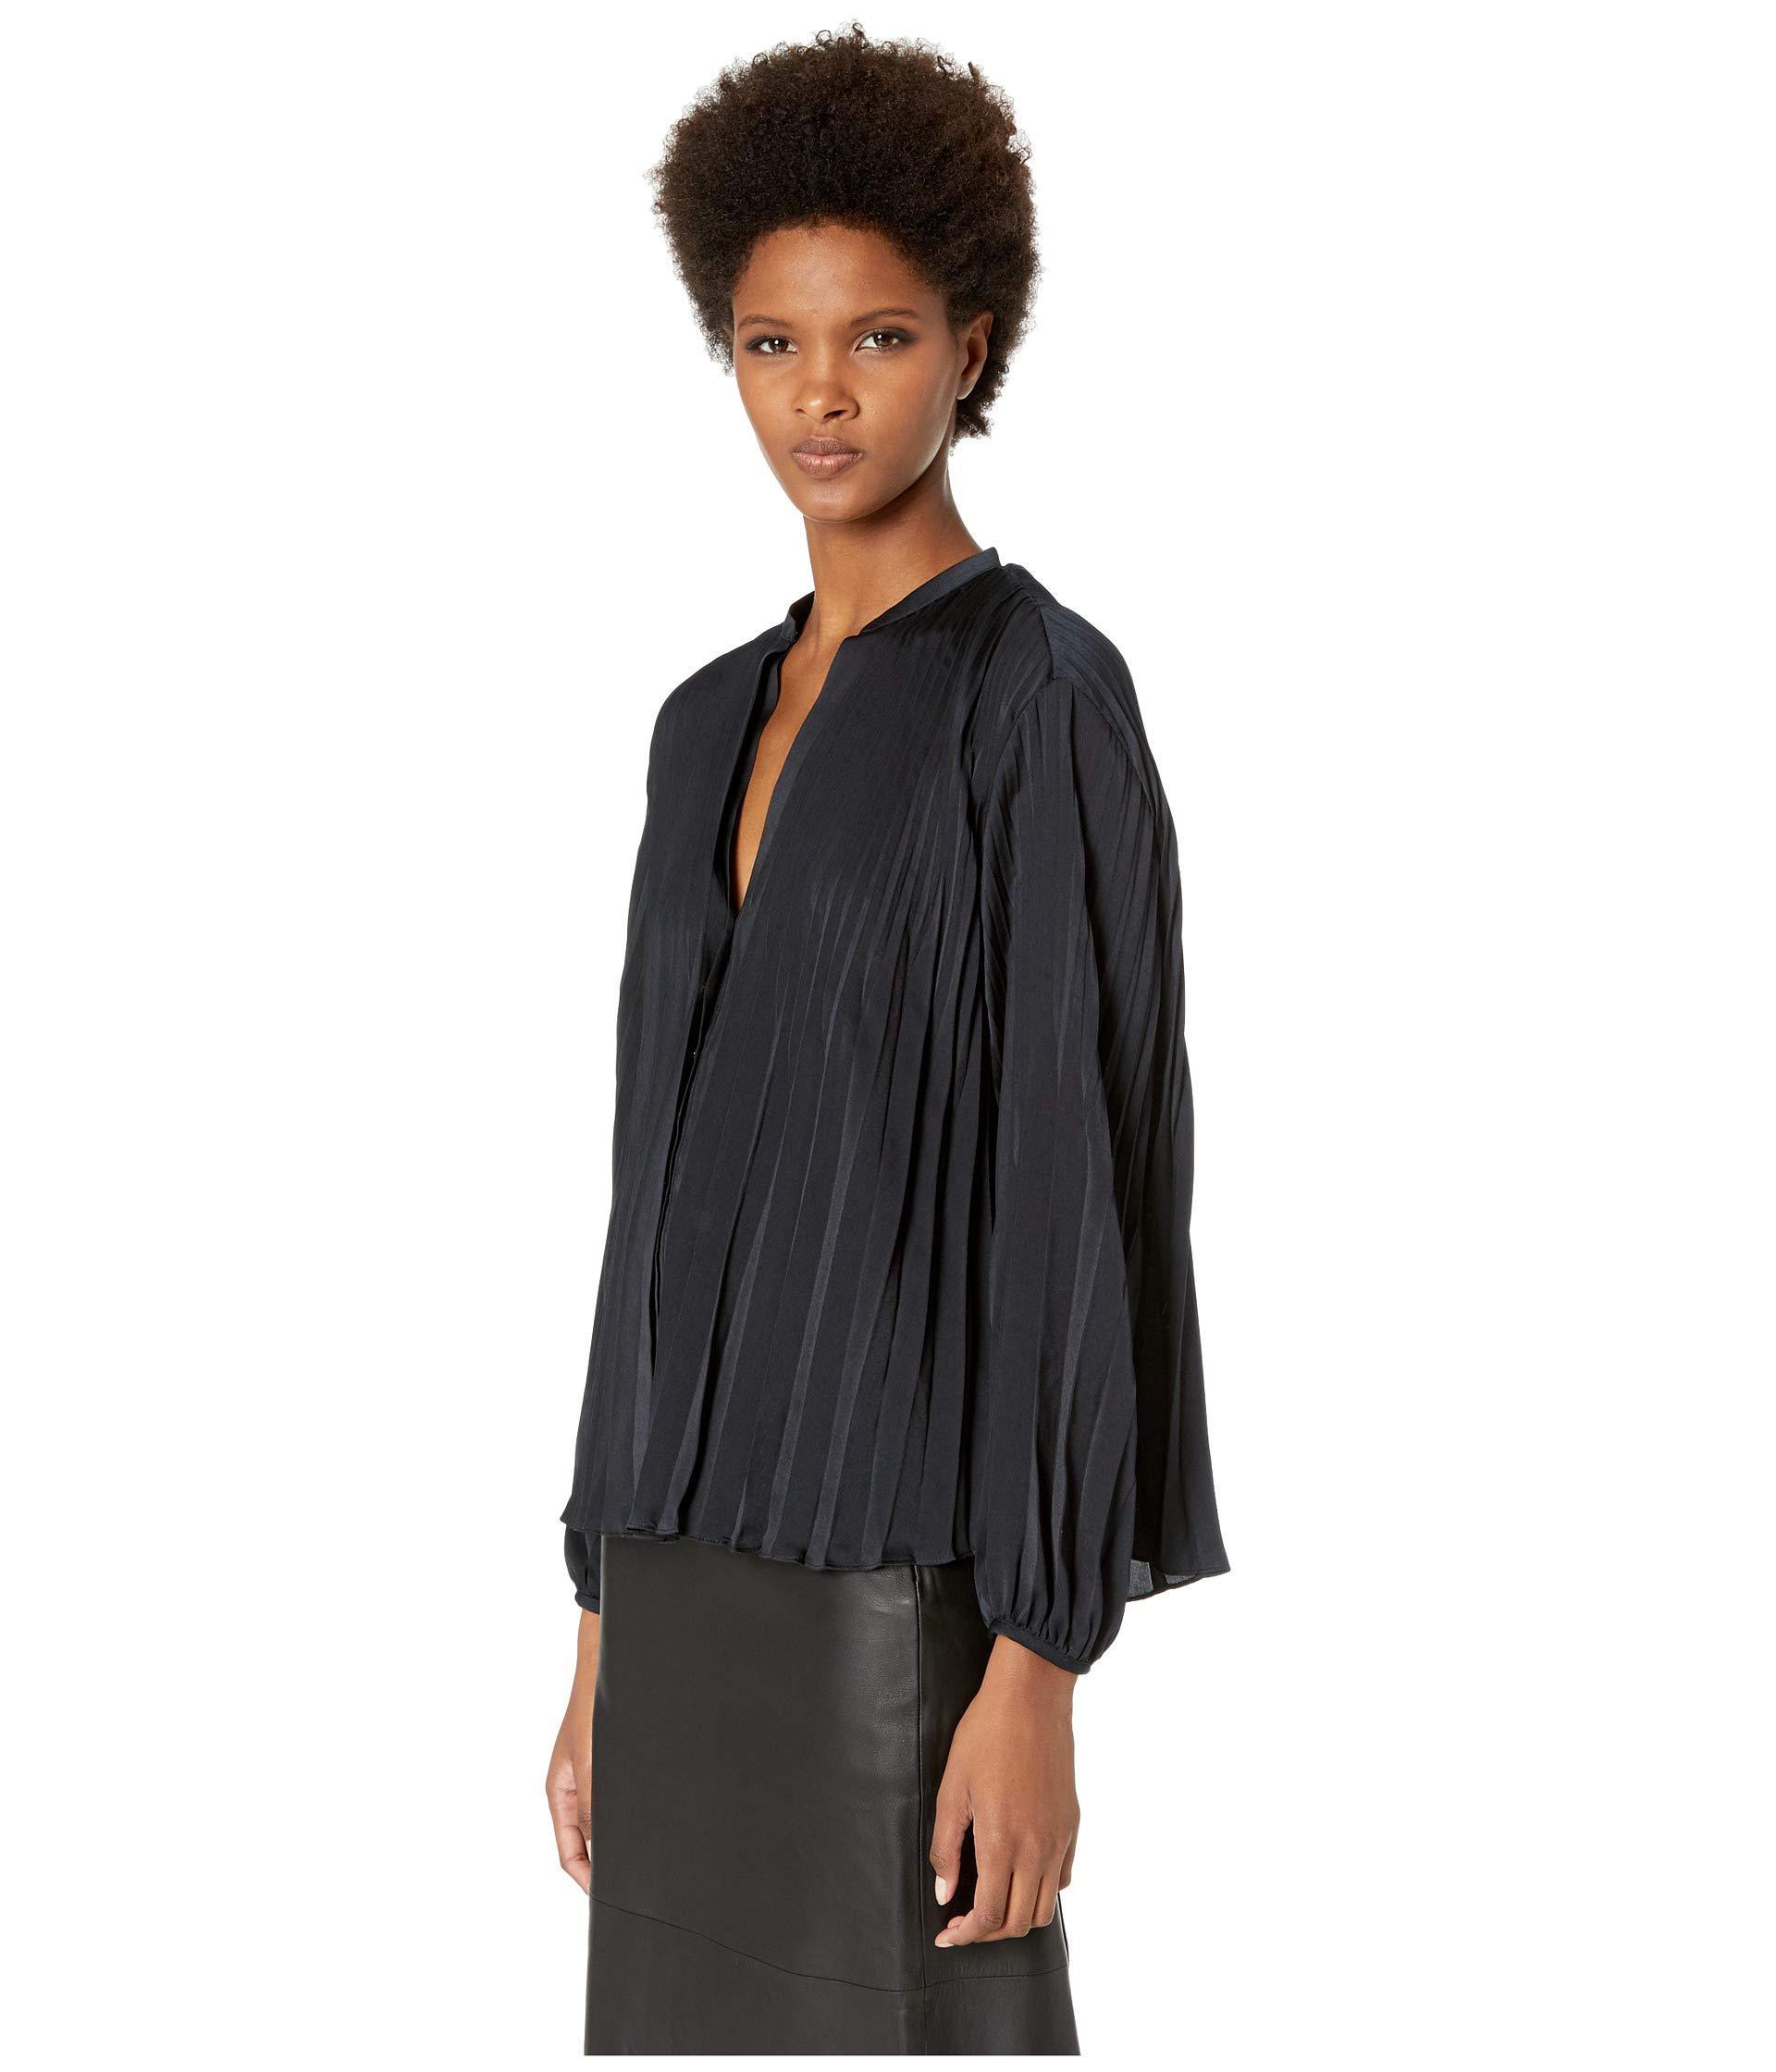 d7653ce801e06 Lyst - Vince Chevron Pleated Blouse (optic White) Women s Clothing in Black